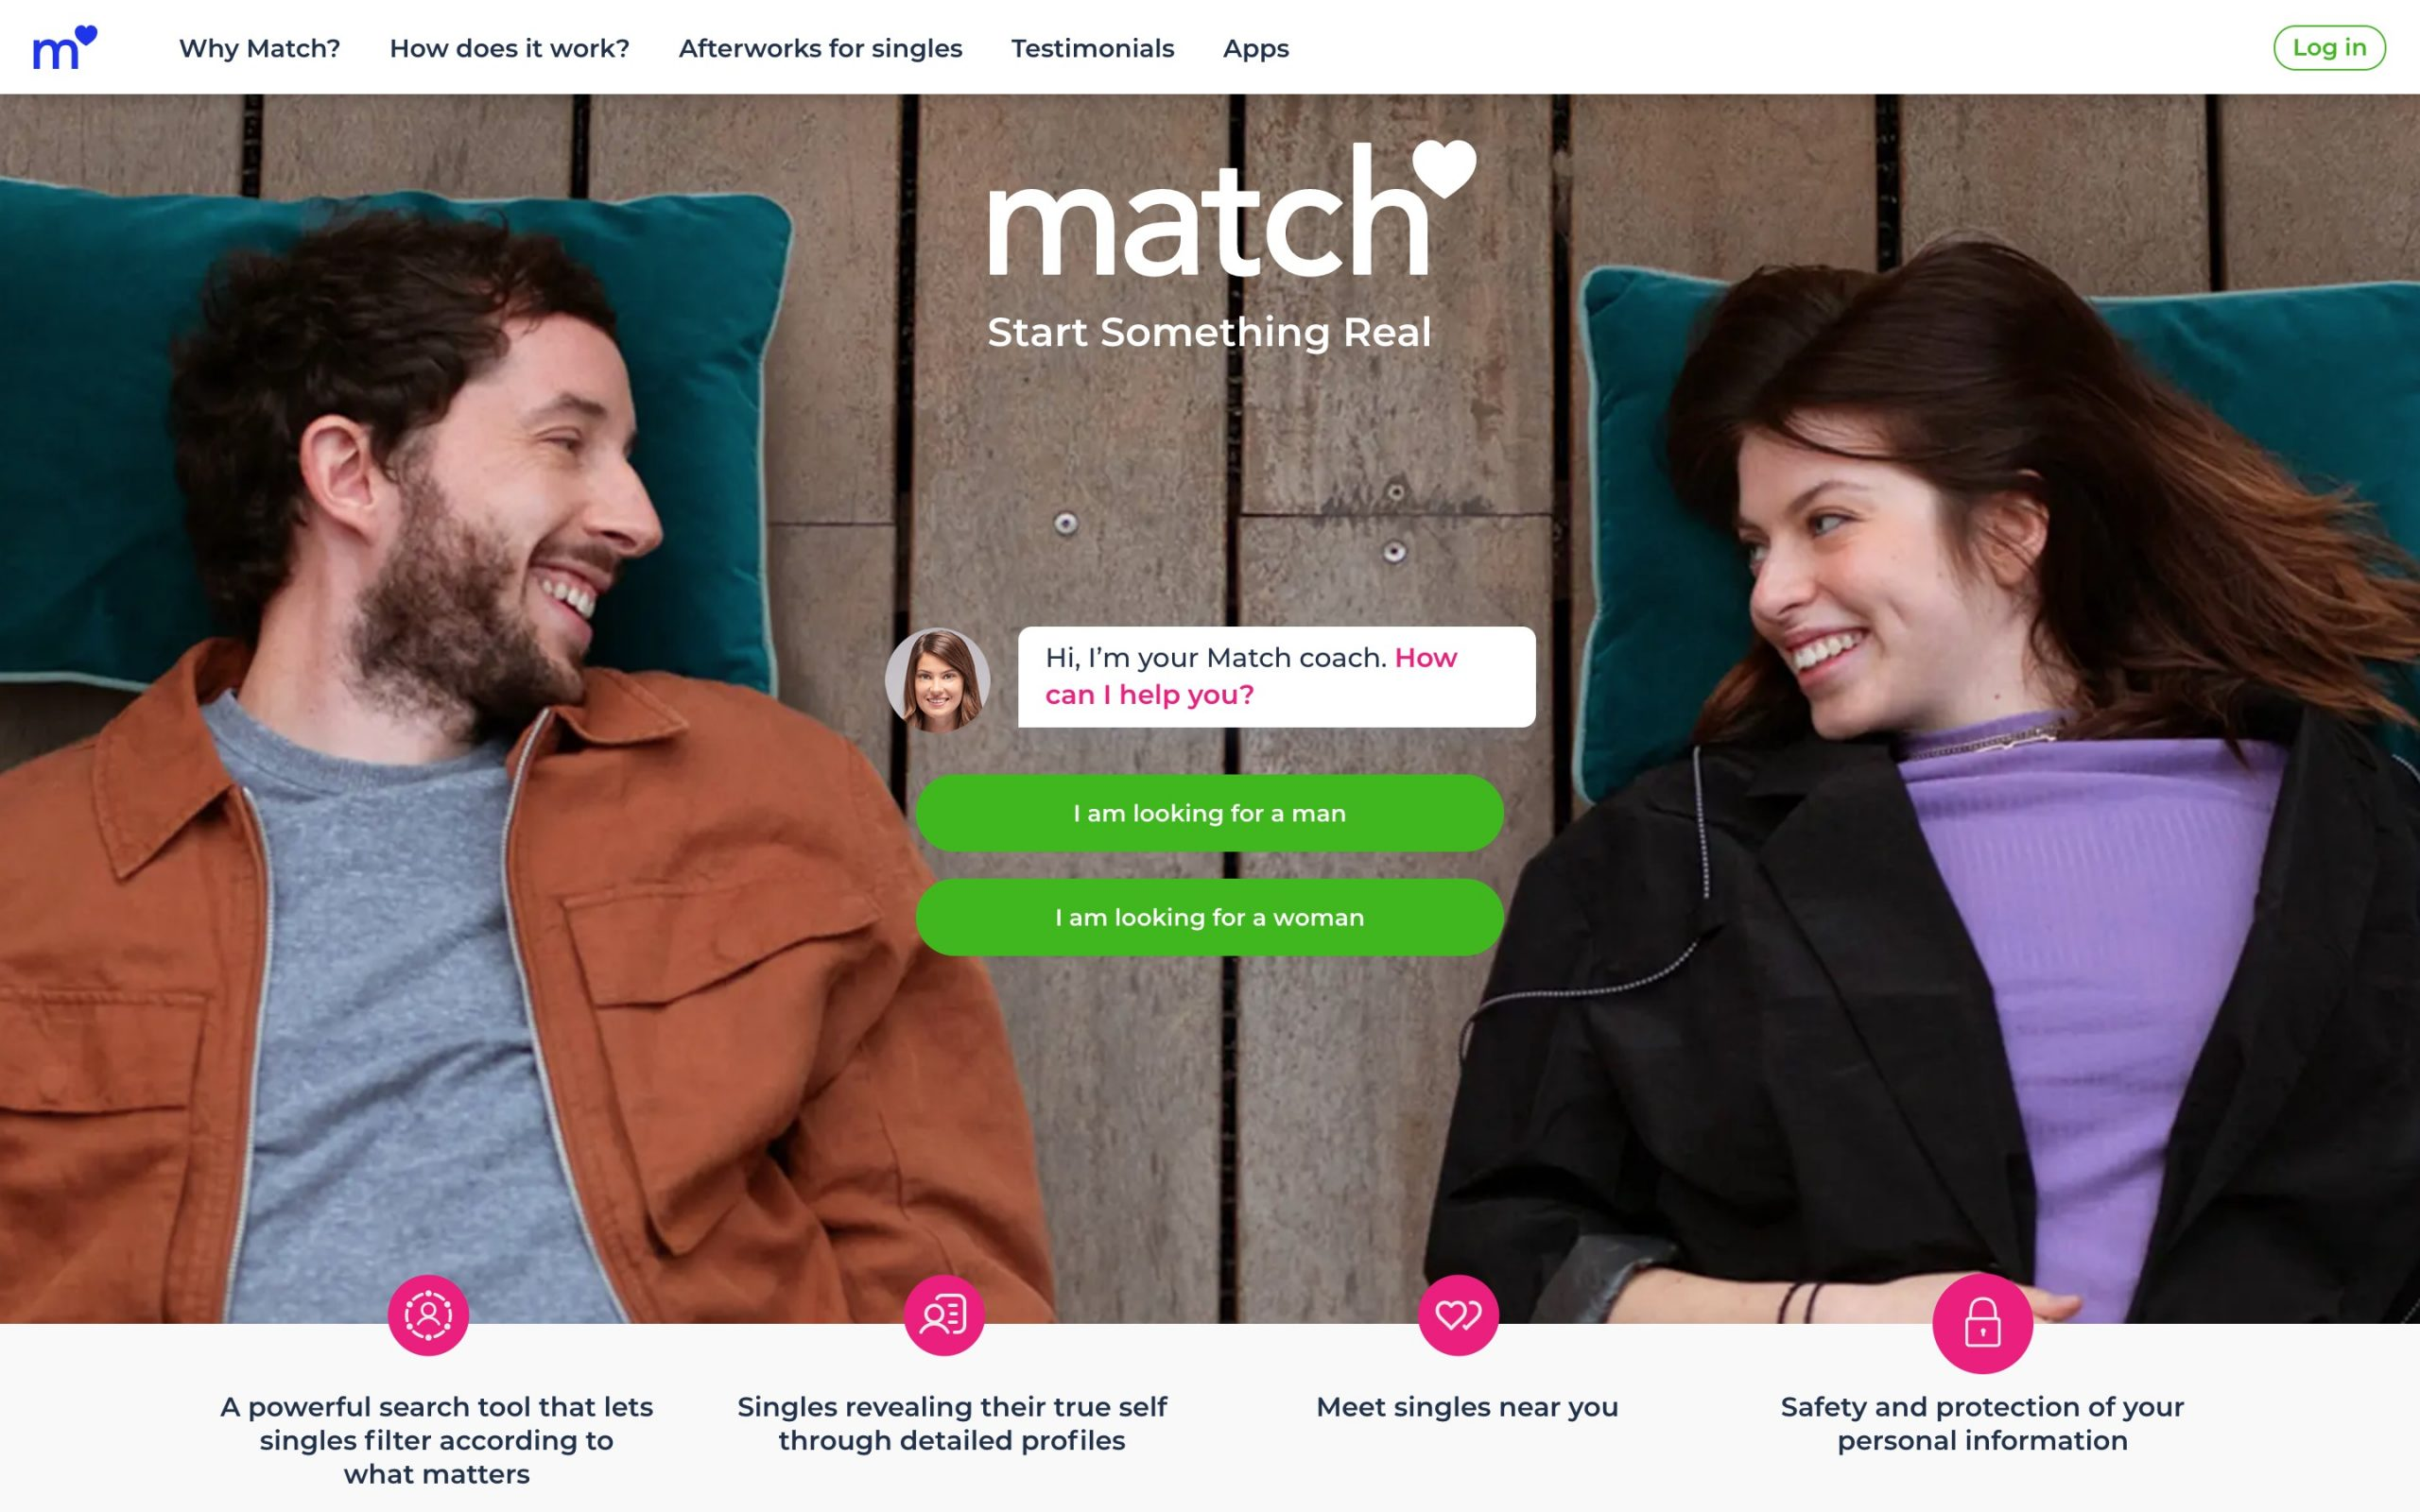 ie.match.com main page